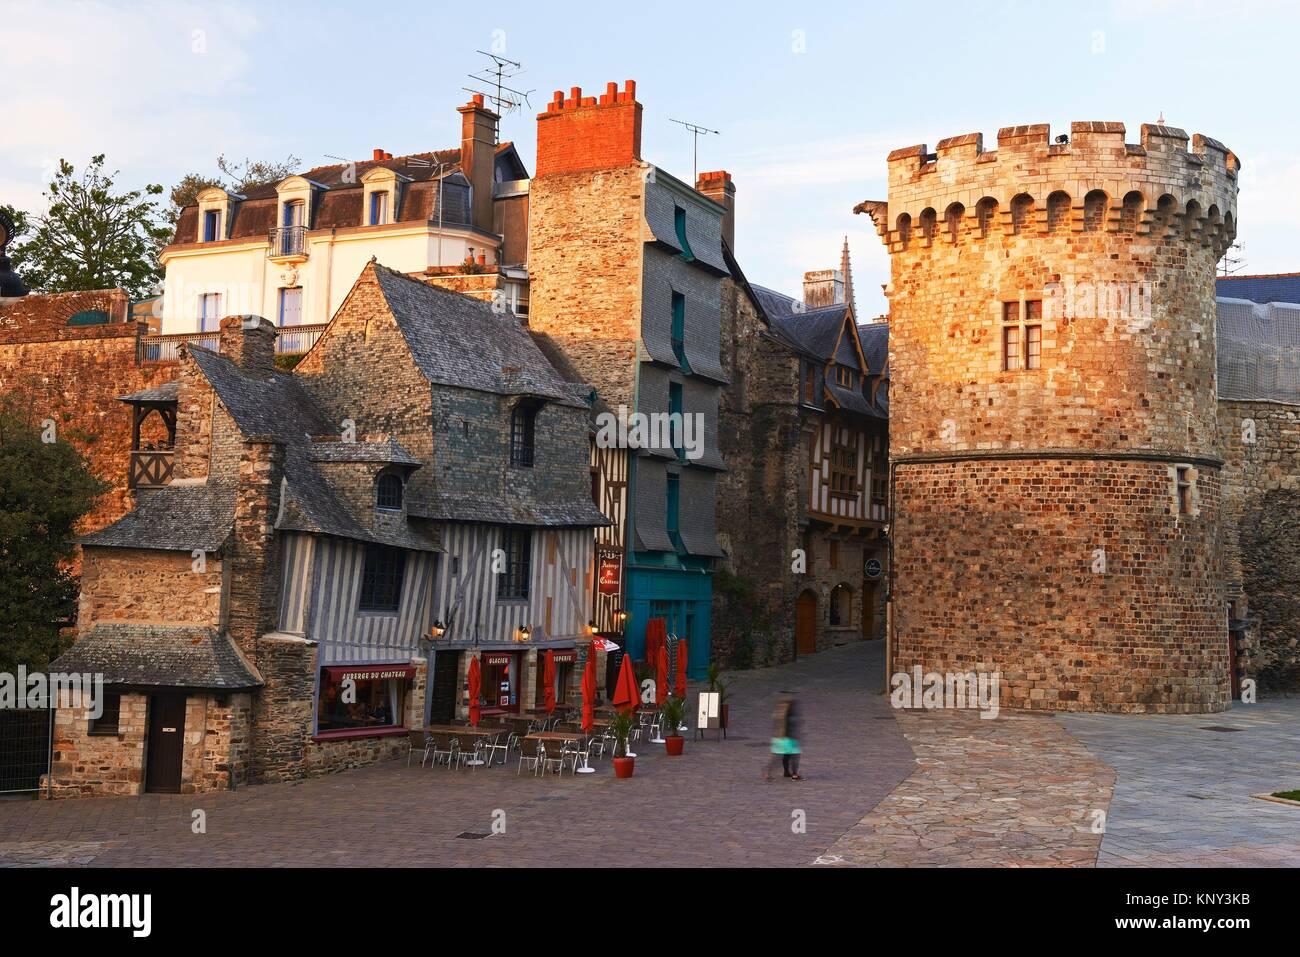 Vitre, Castle And Typical Houses, Ille Et Vilaine, Bretagne, Brittany